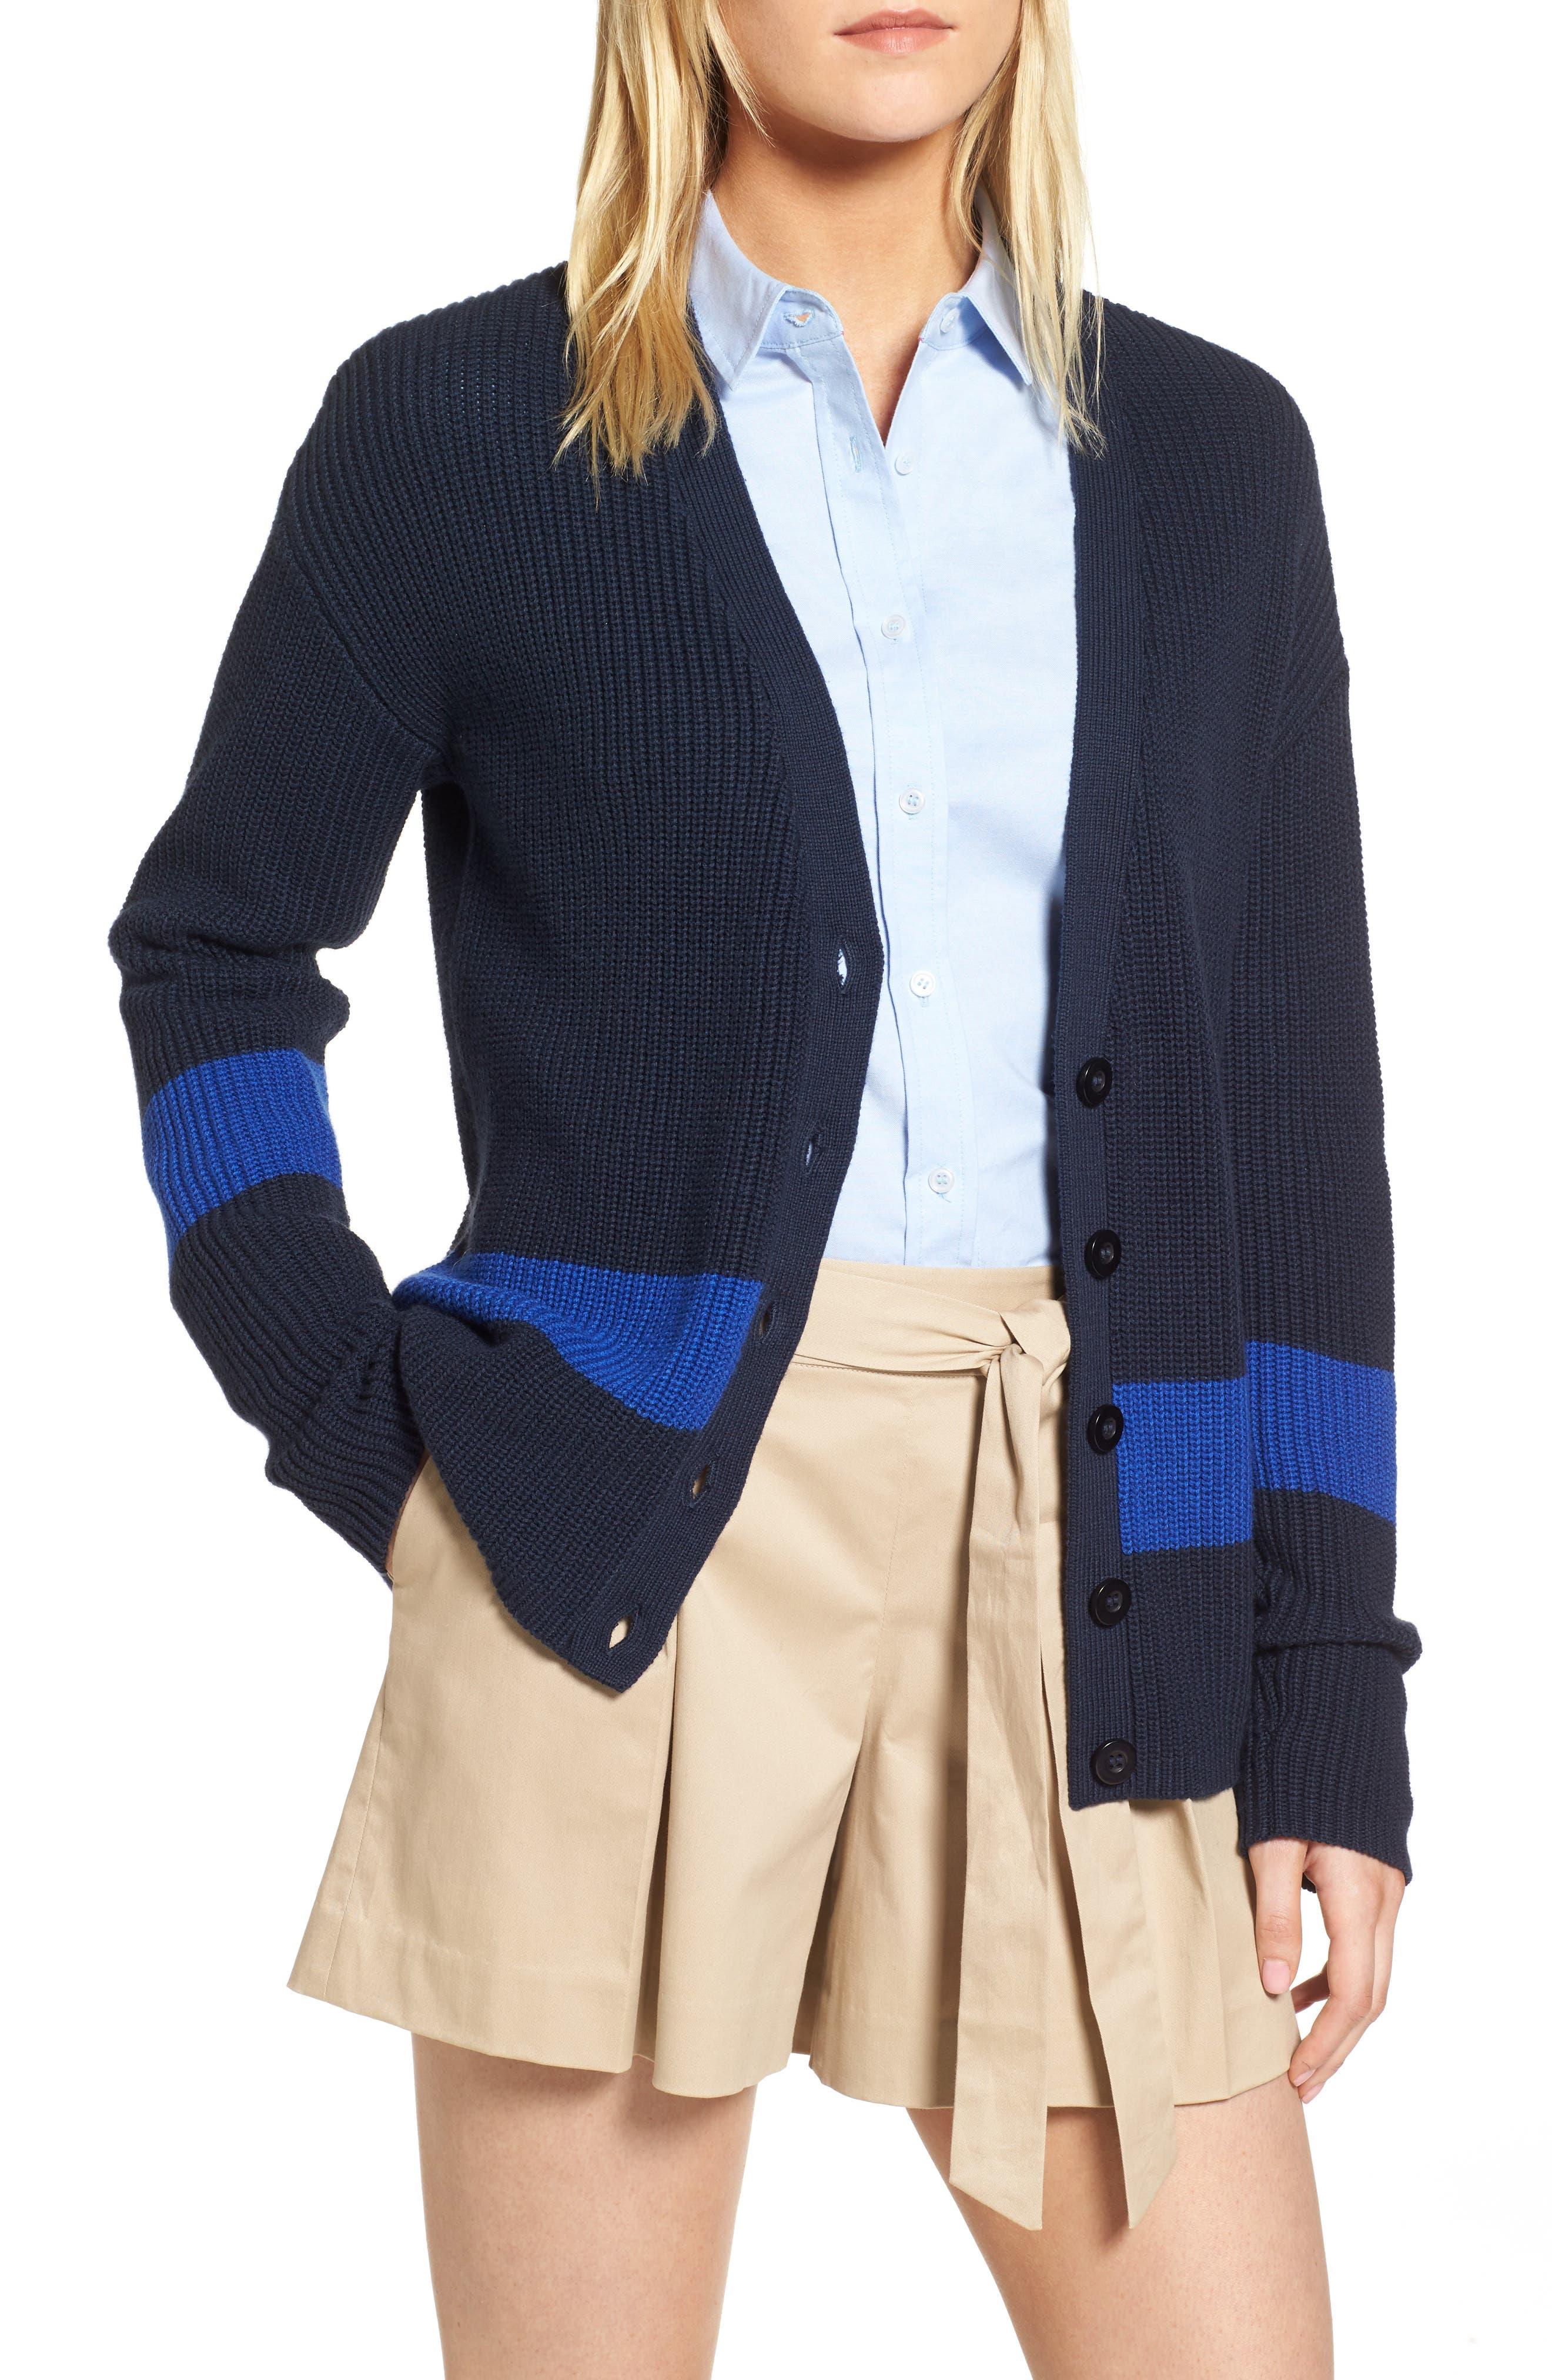 Shaker Knit Cardigan,                         Main,                         color, Navy- Blue Colorblock